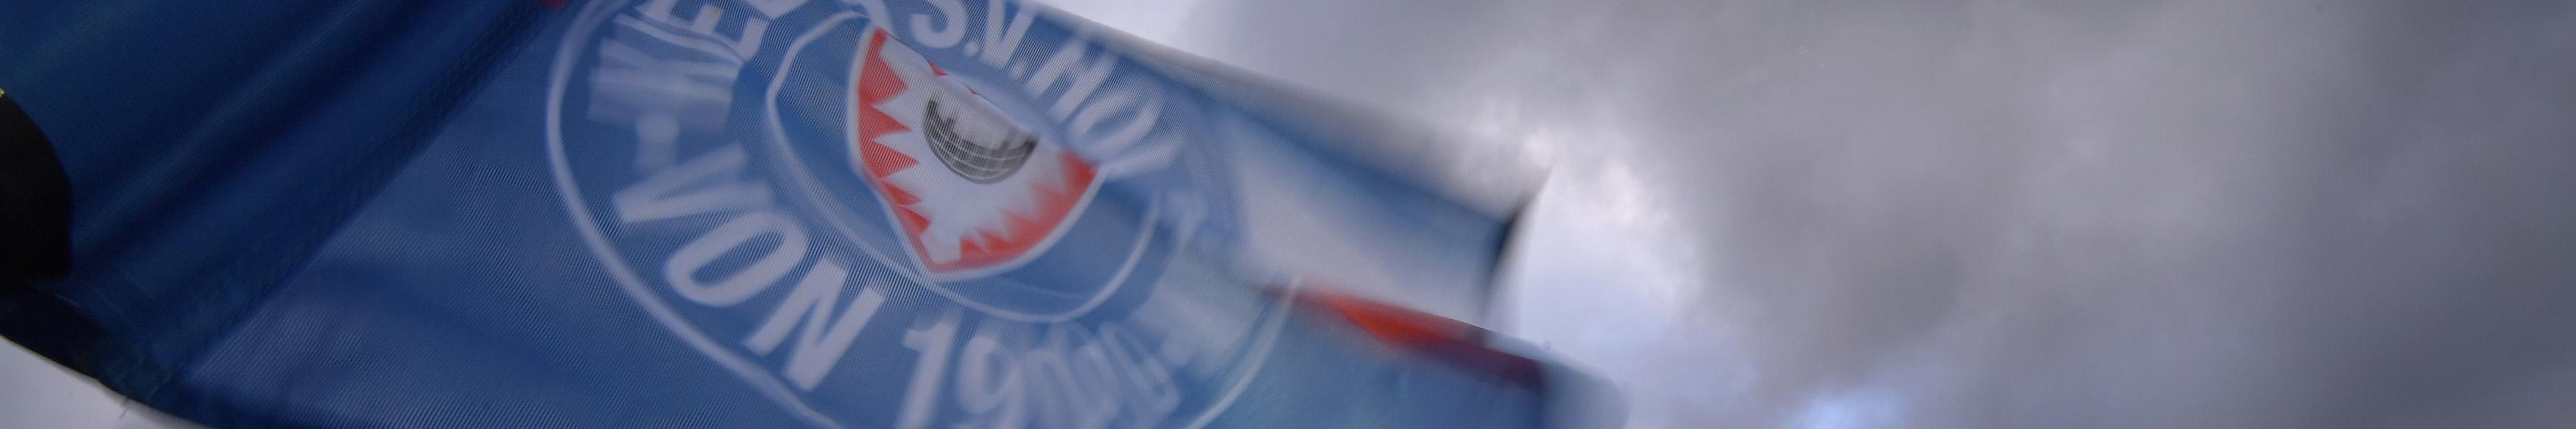 Holstein Kiel - 1. FC Nürnberg: Topspiel Richtung Bundesliga